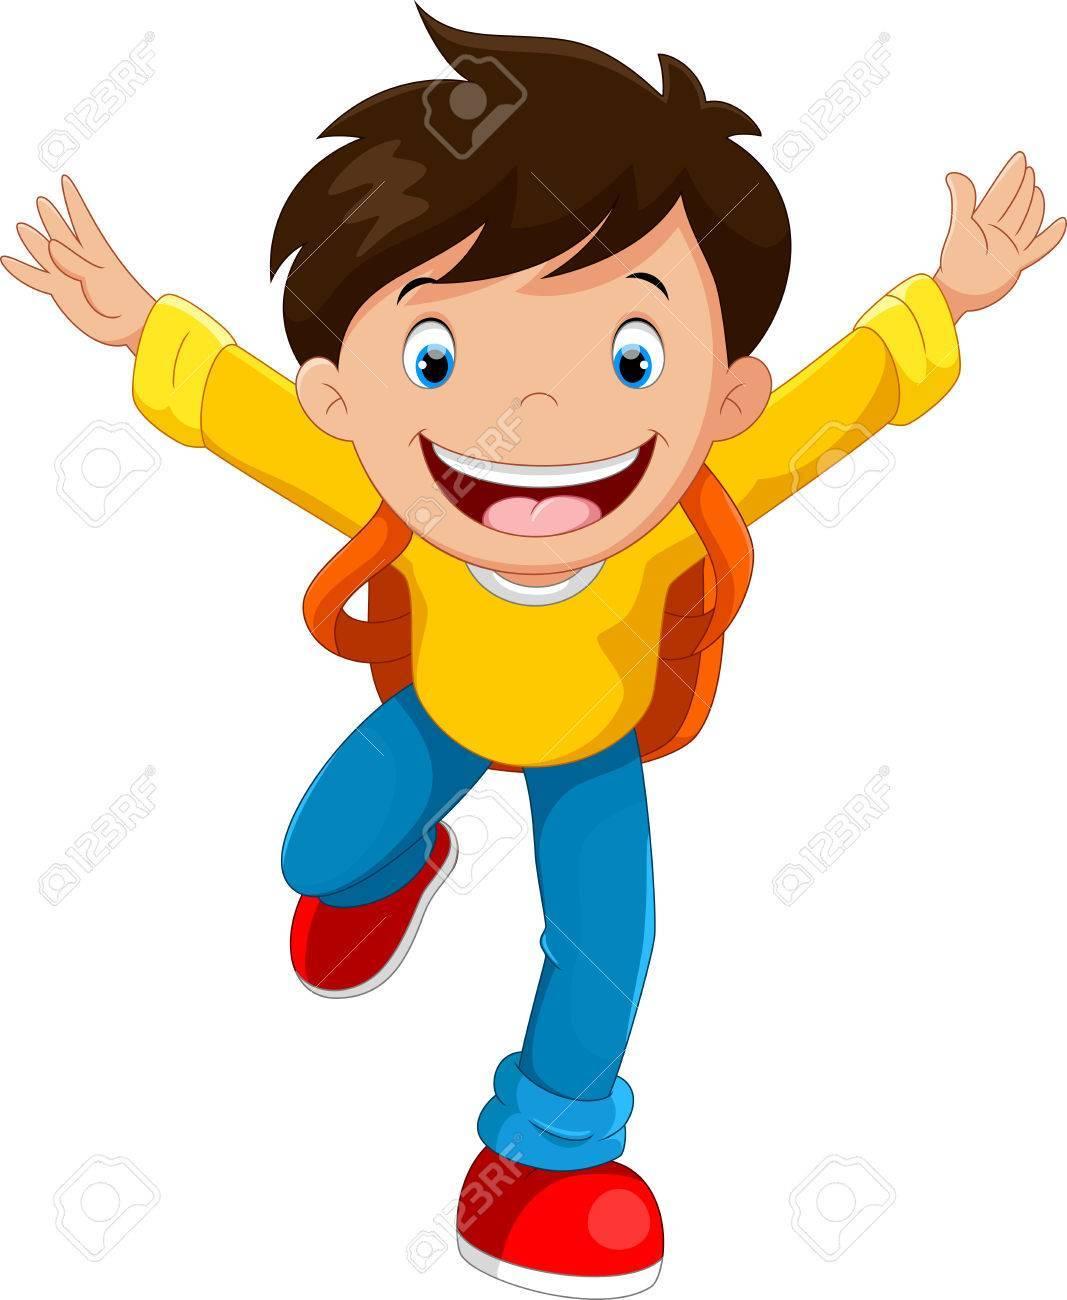 Happy school boy clipart 9 » Clipart Portal.